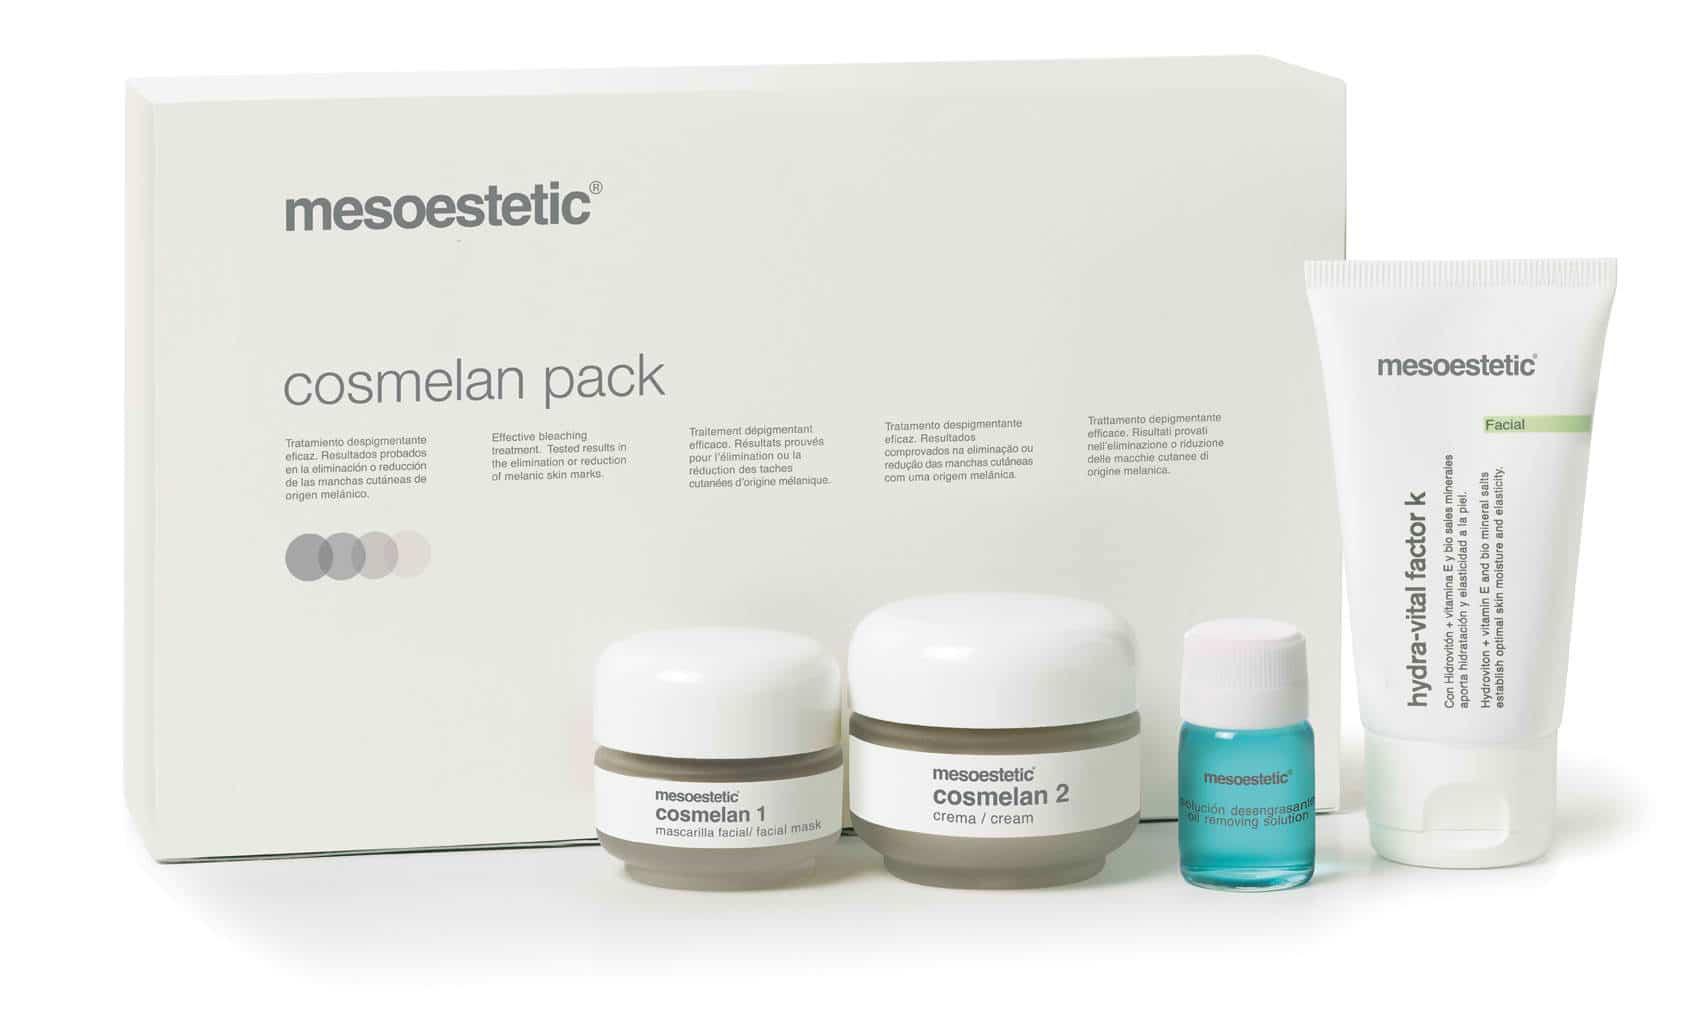 MESOESTETIC COSMELAN 2 CREAM 30G, Botox 100 IU,Glutax 8000Gz